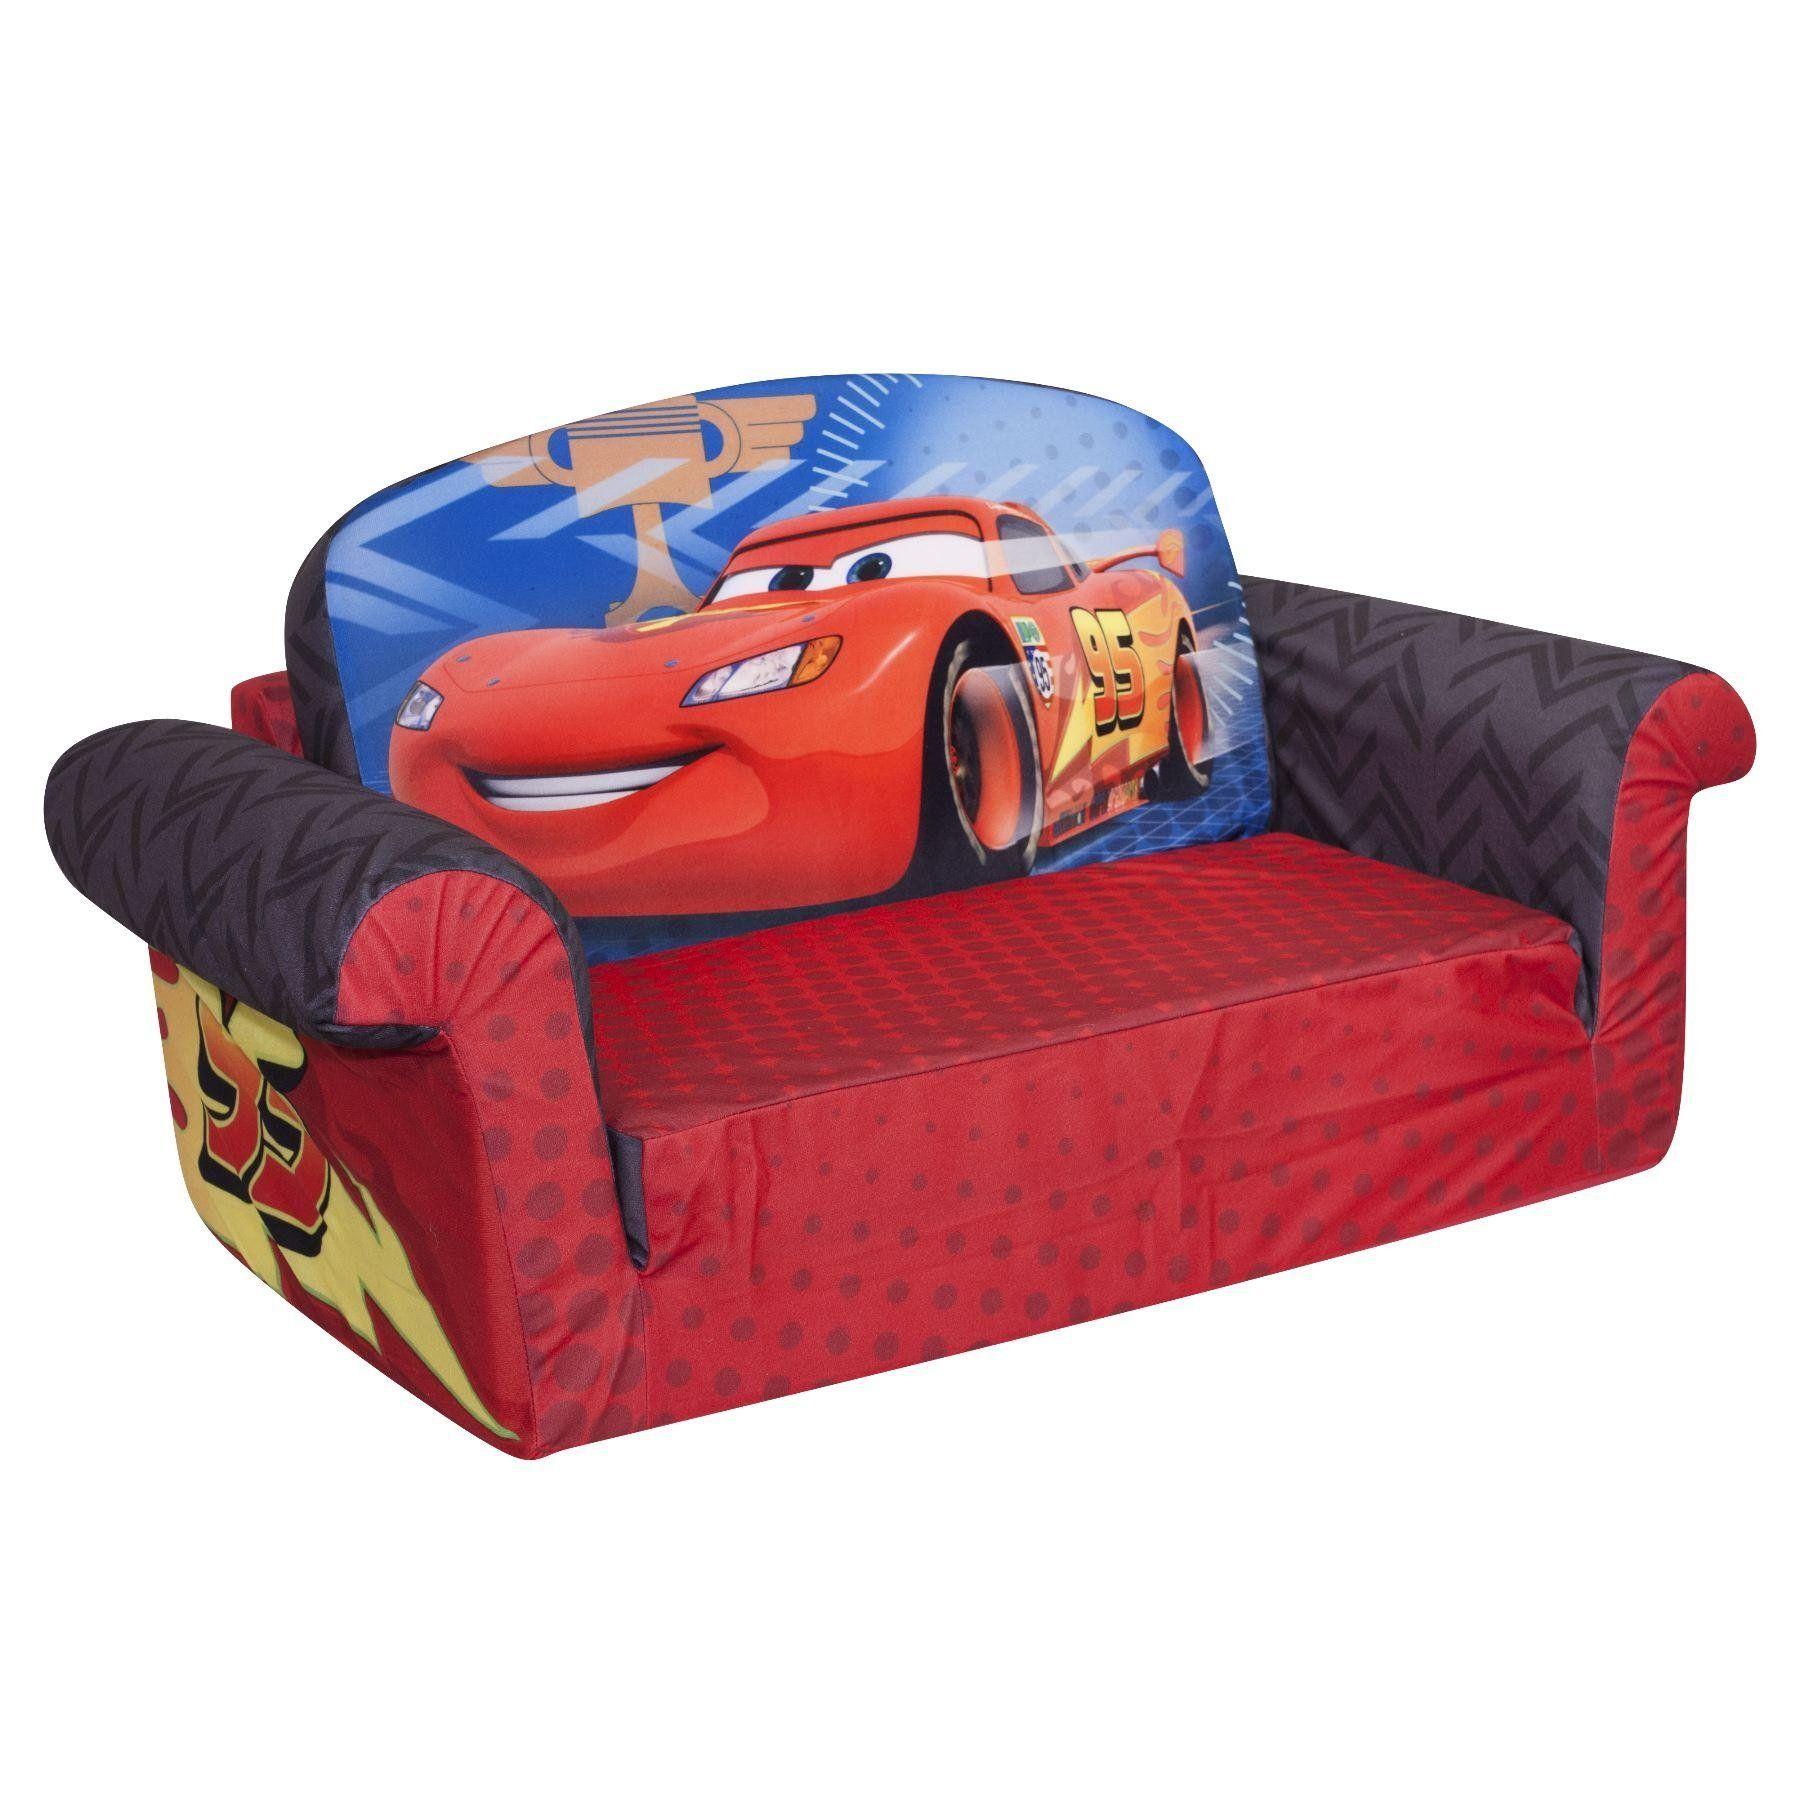 Amazon Marshmallow Children s Furniture 2 in 1 Flip Open